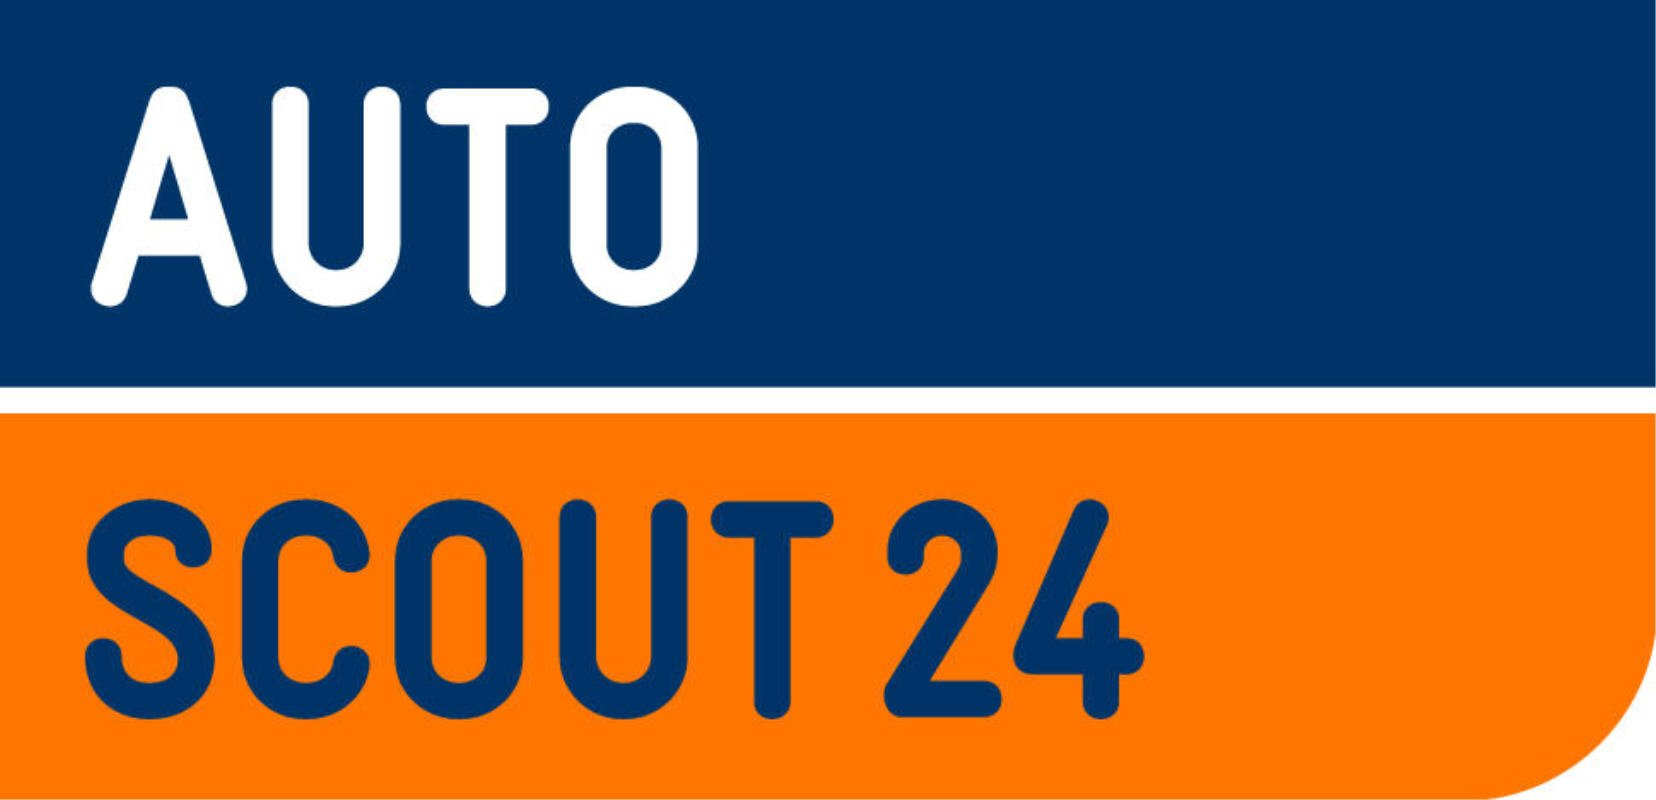 AUTO SCOUT 24 logo